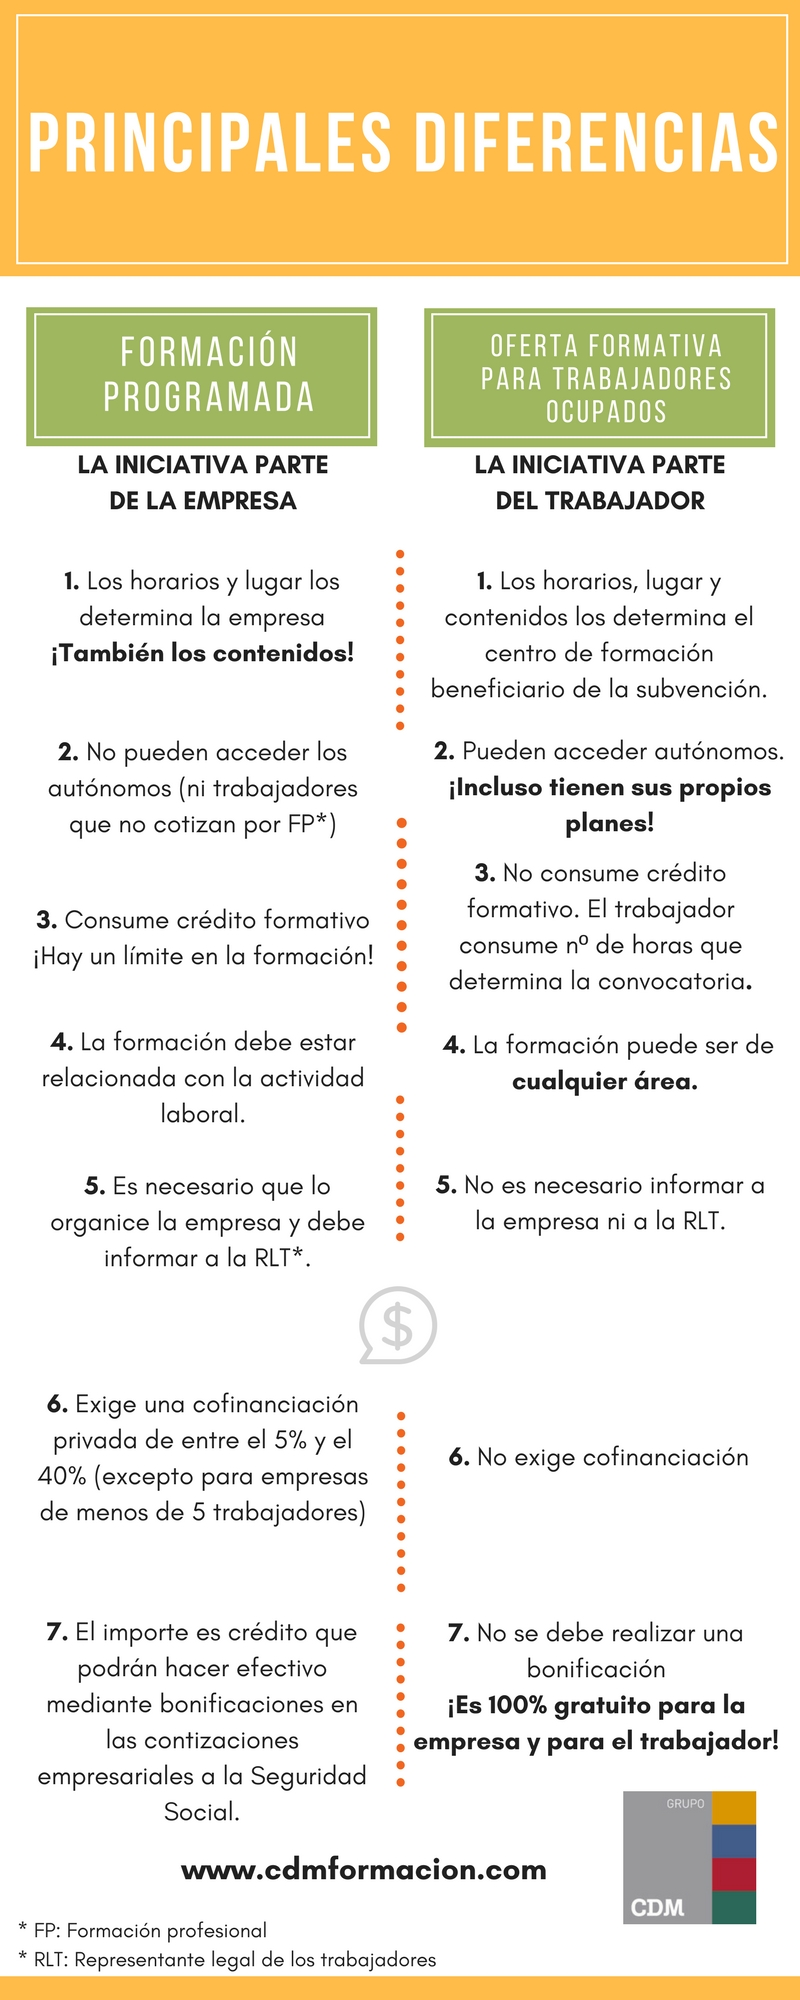 infografia_formacionprogramada_cdm